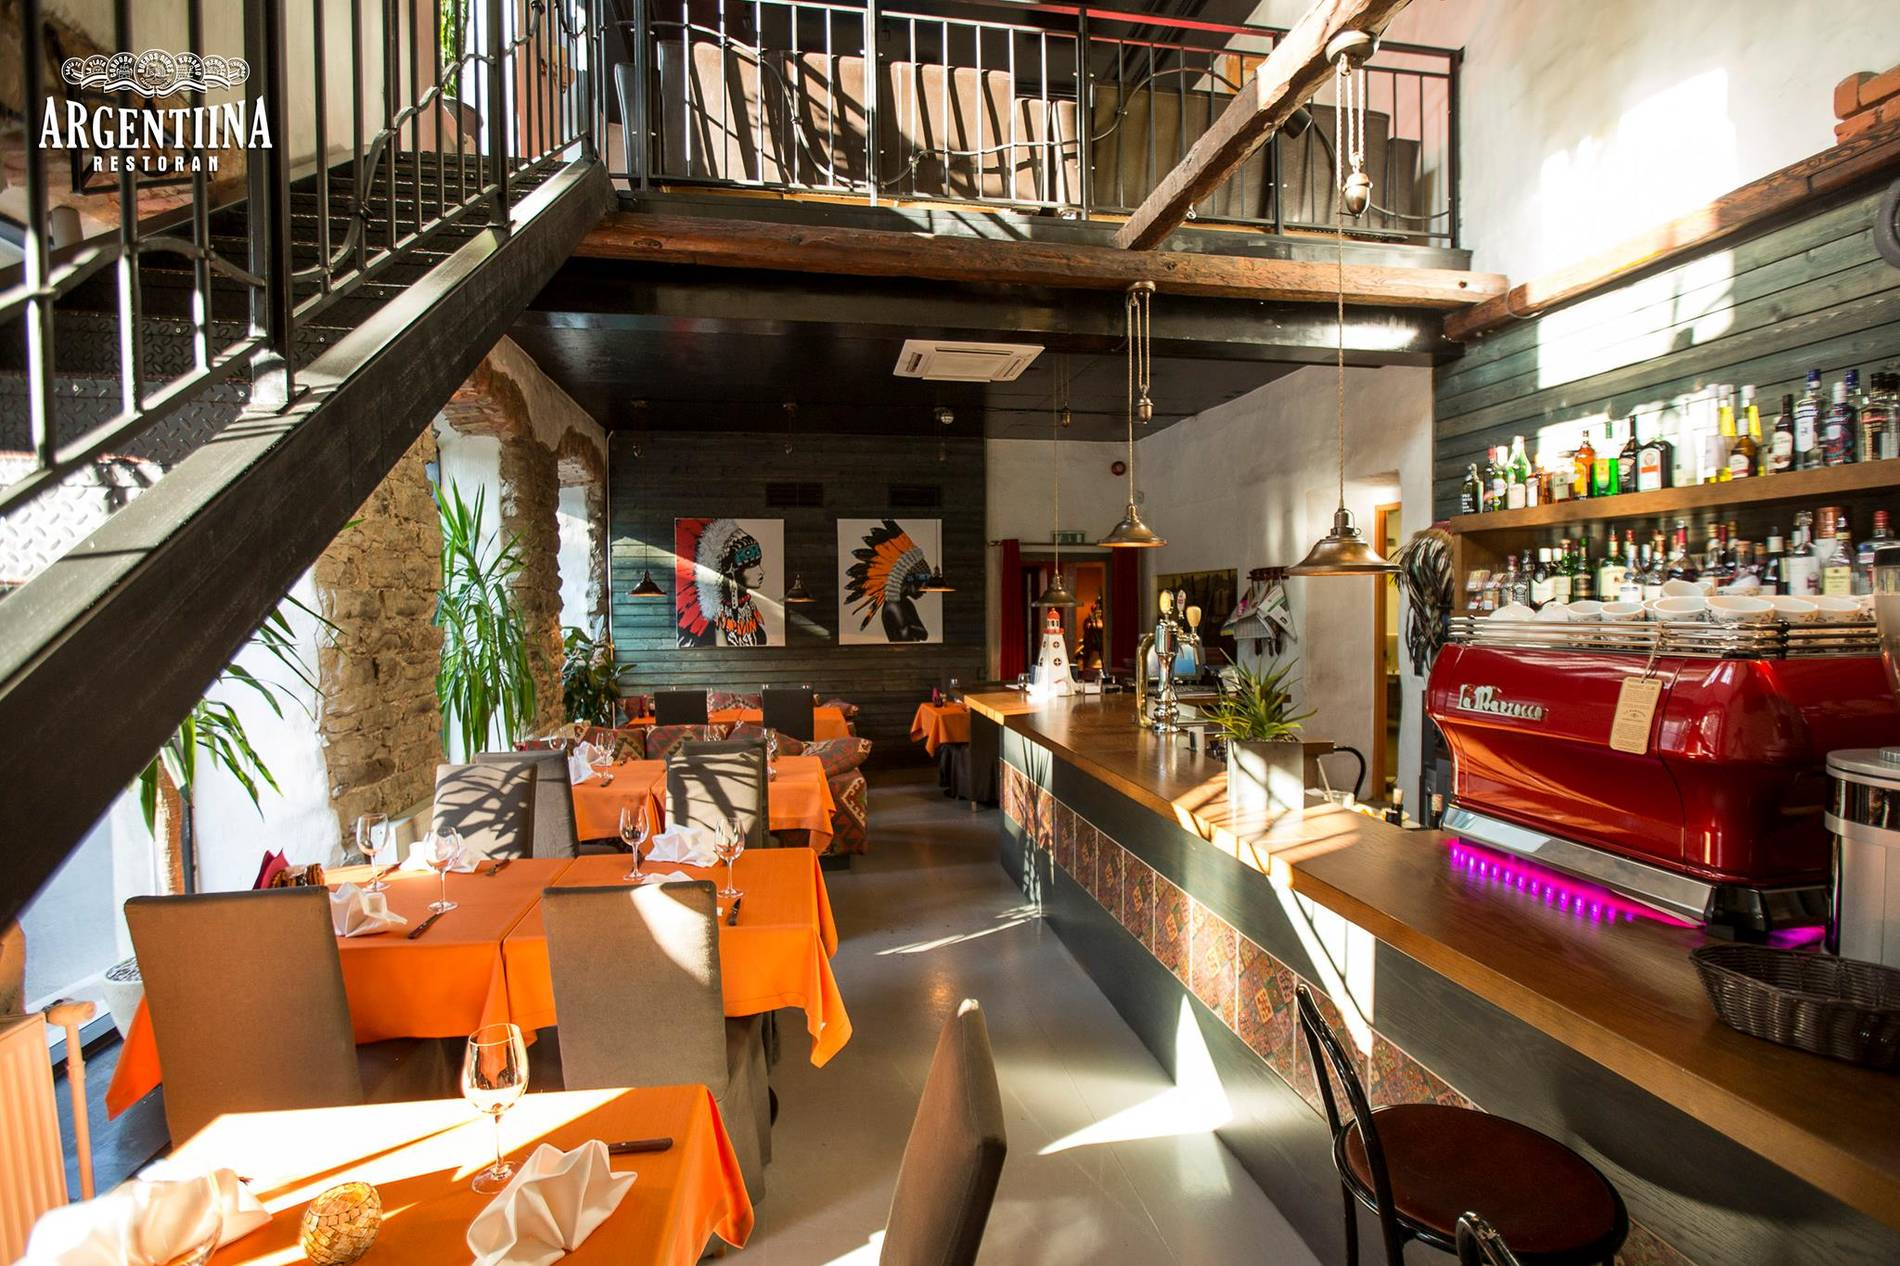 Argentiina restoran in Tallinn, Estonia